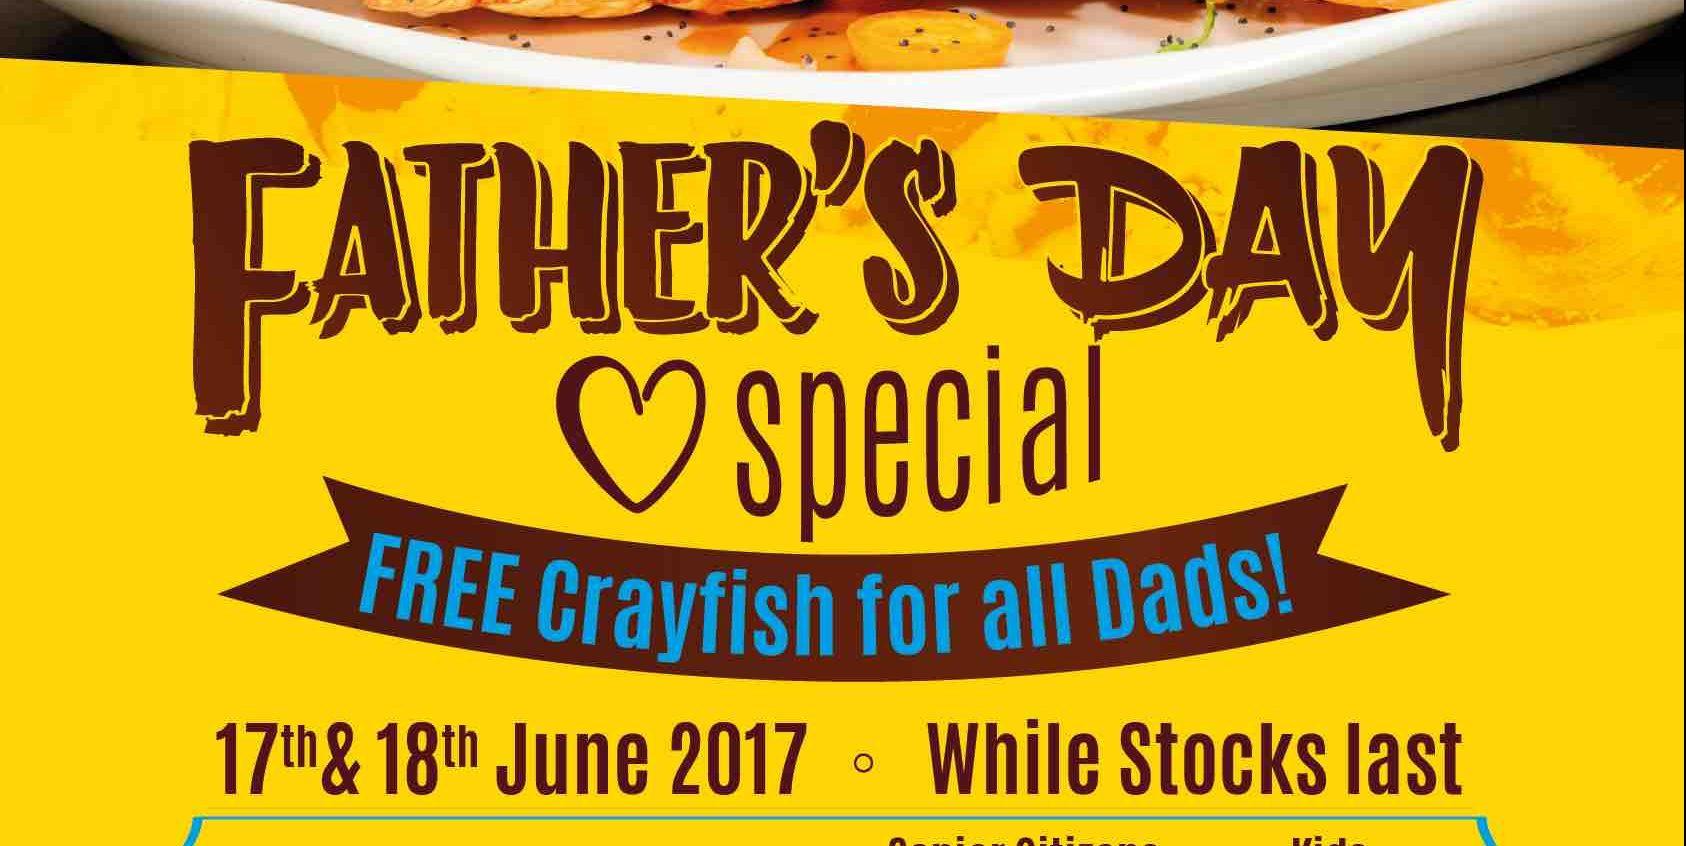 Sakura International Buffet SG FREE Crayfish Father's Day Promotion 17-18 Jun 2017